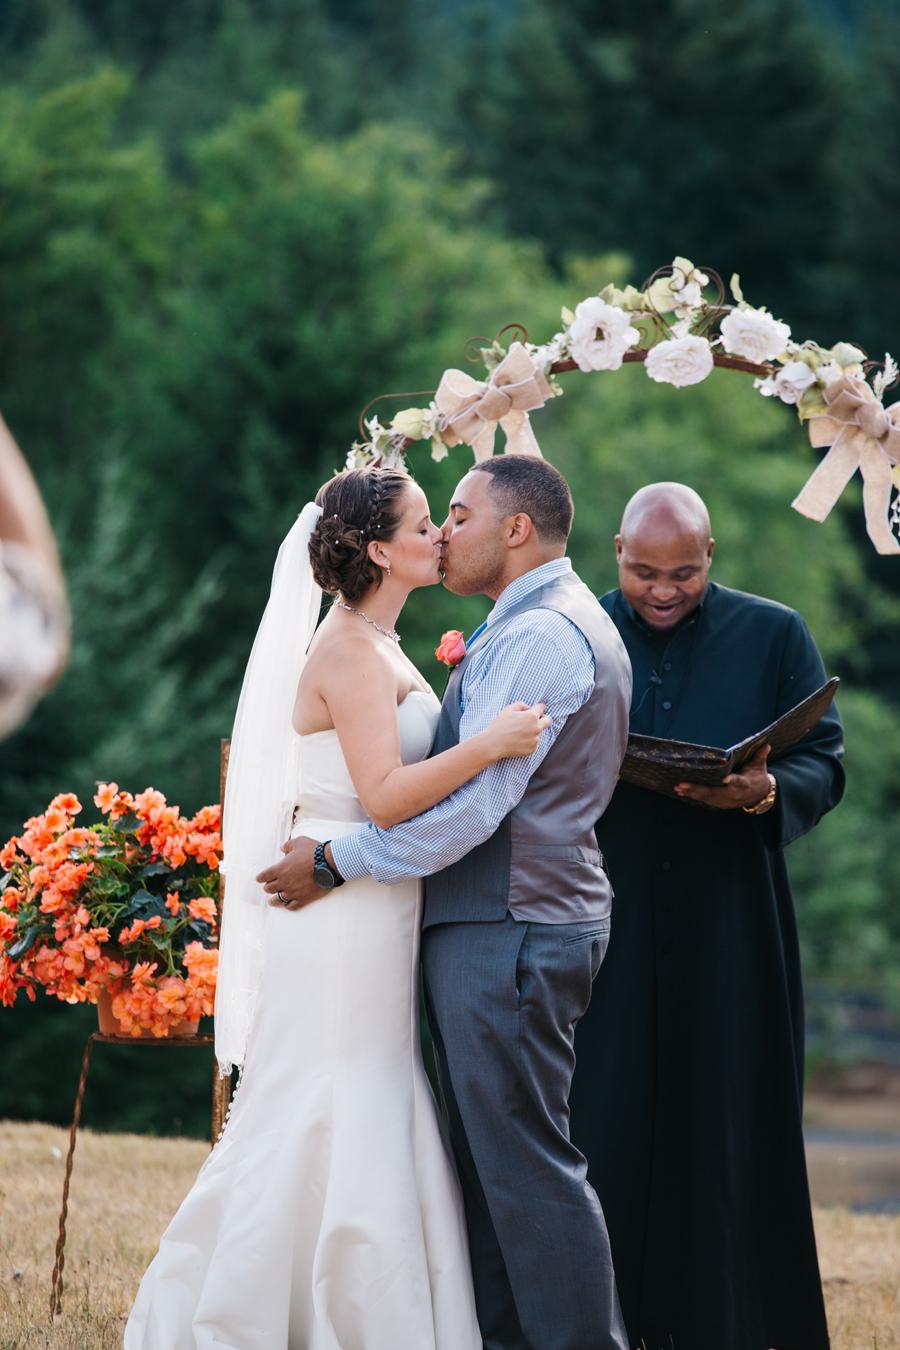 079-portland-oregon-silverton-tree-farm-wedding-katheryn-moran-photography.jpg